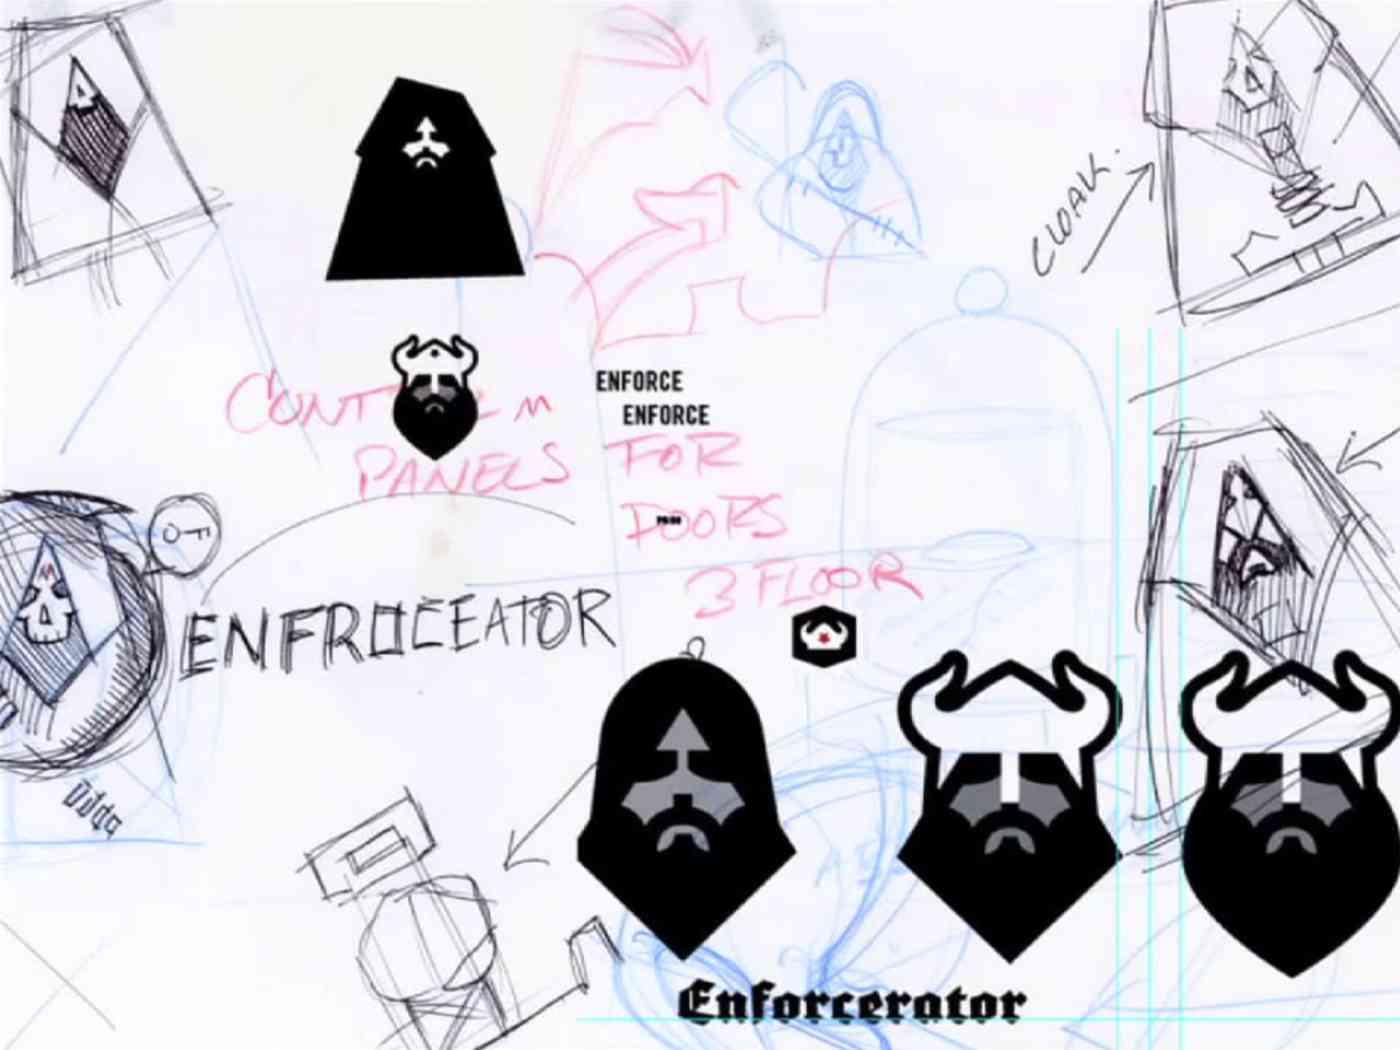 Viking sketches